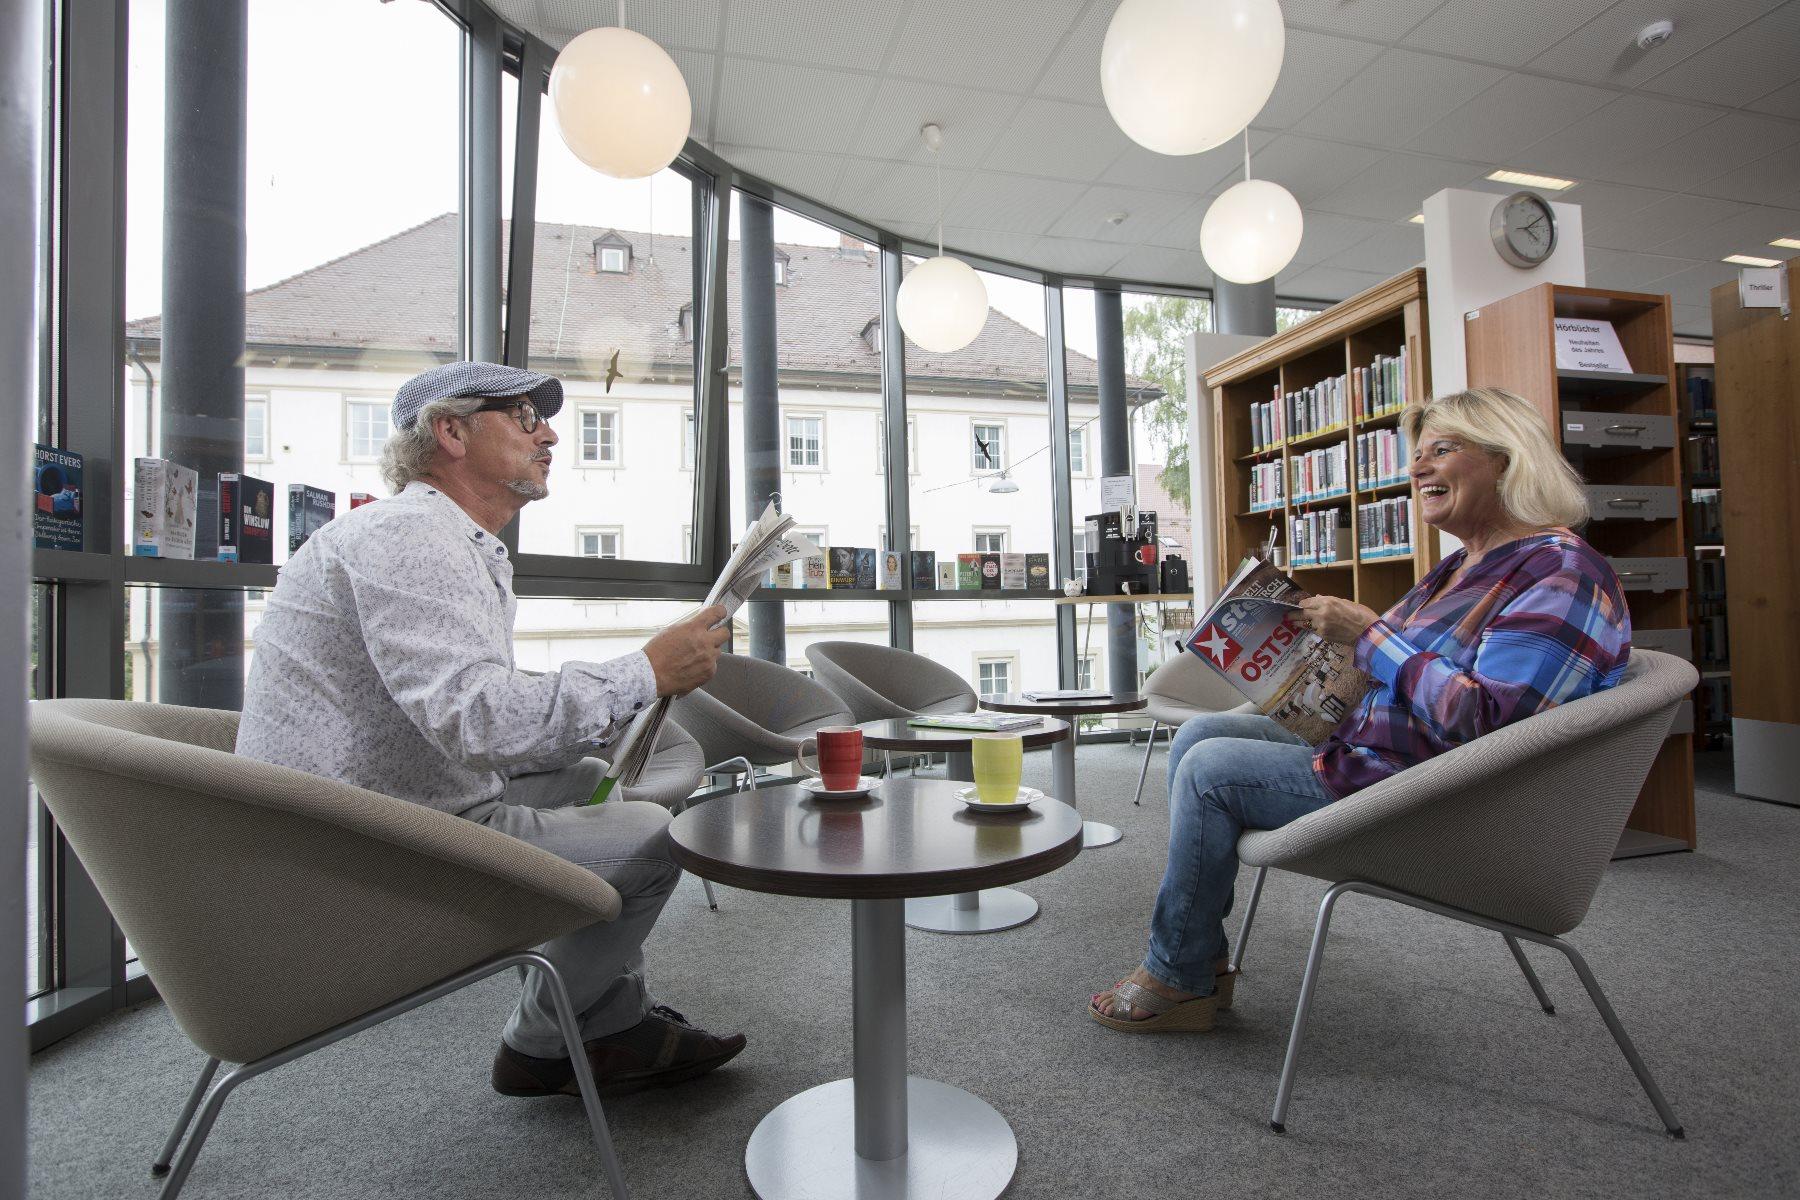 Sitzgelegenheit im Lesecafé